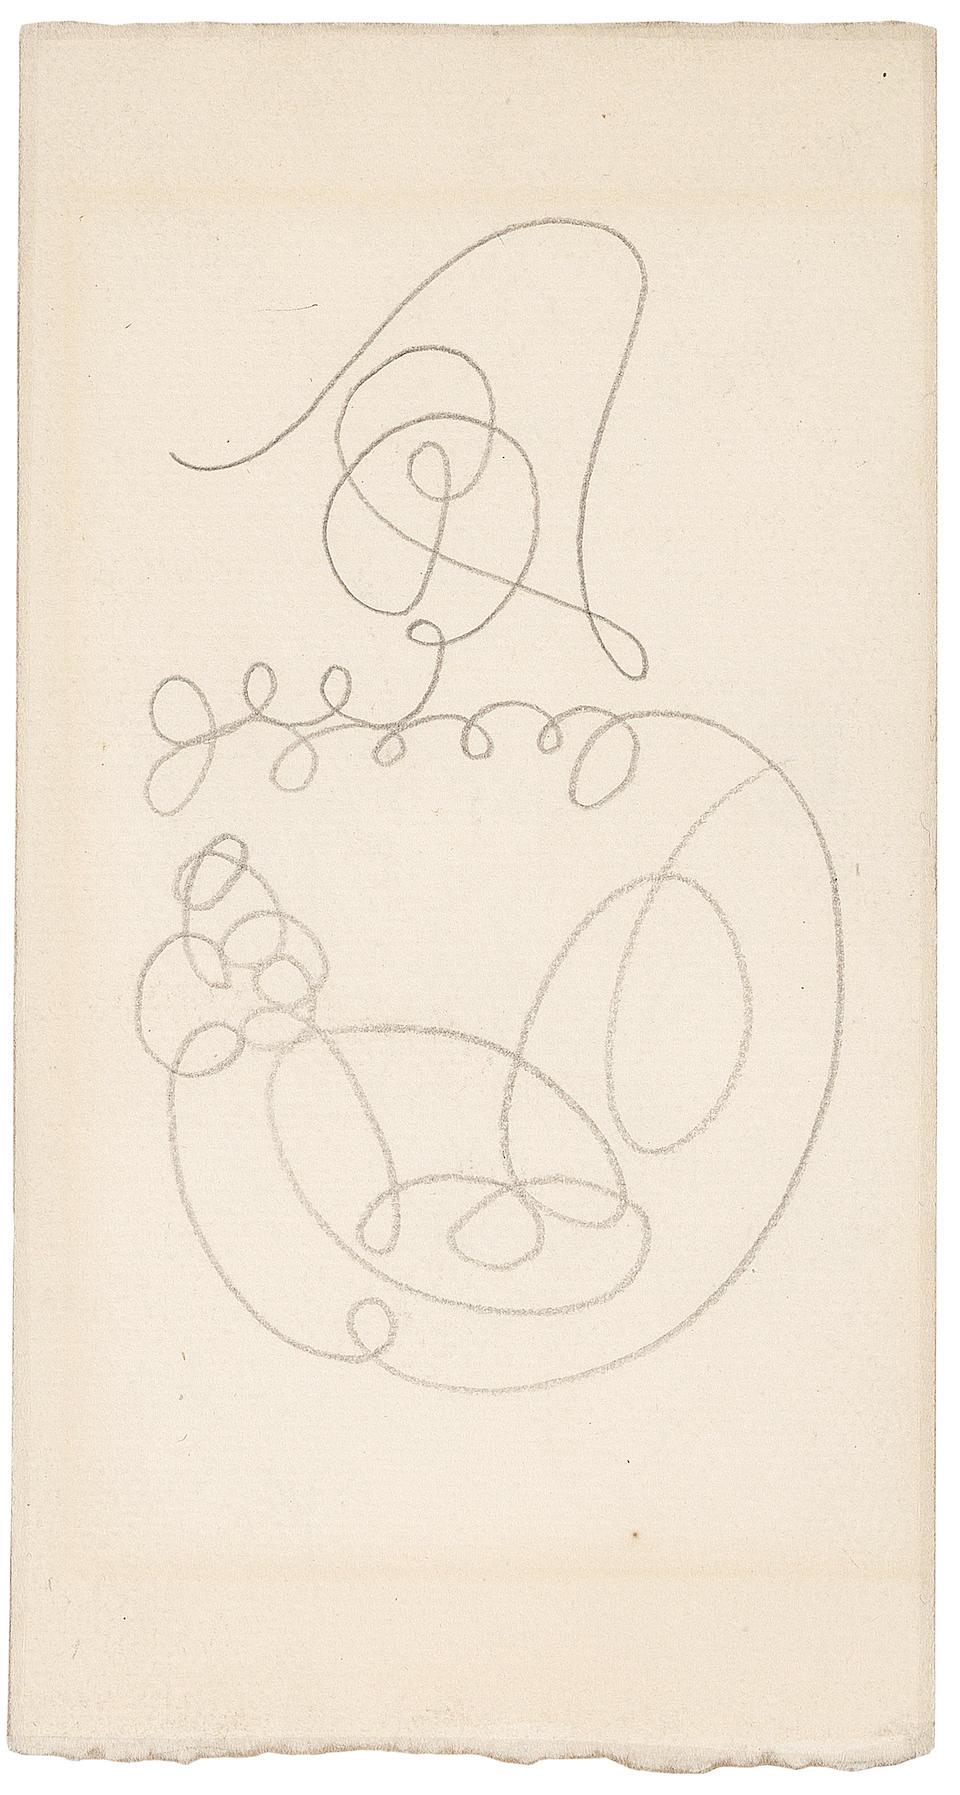 PABLO PICASSO (1881-1973) Chapeaux d'arlequin (recto); Arlequin (verso), circa 1918